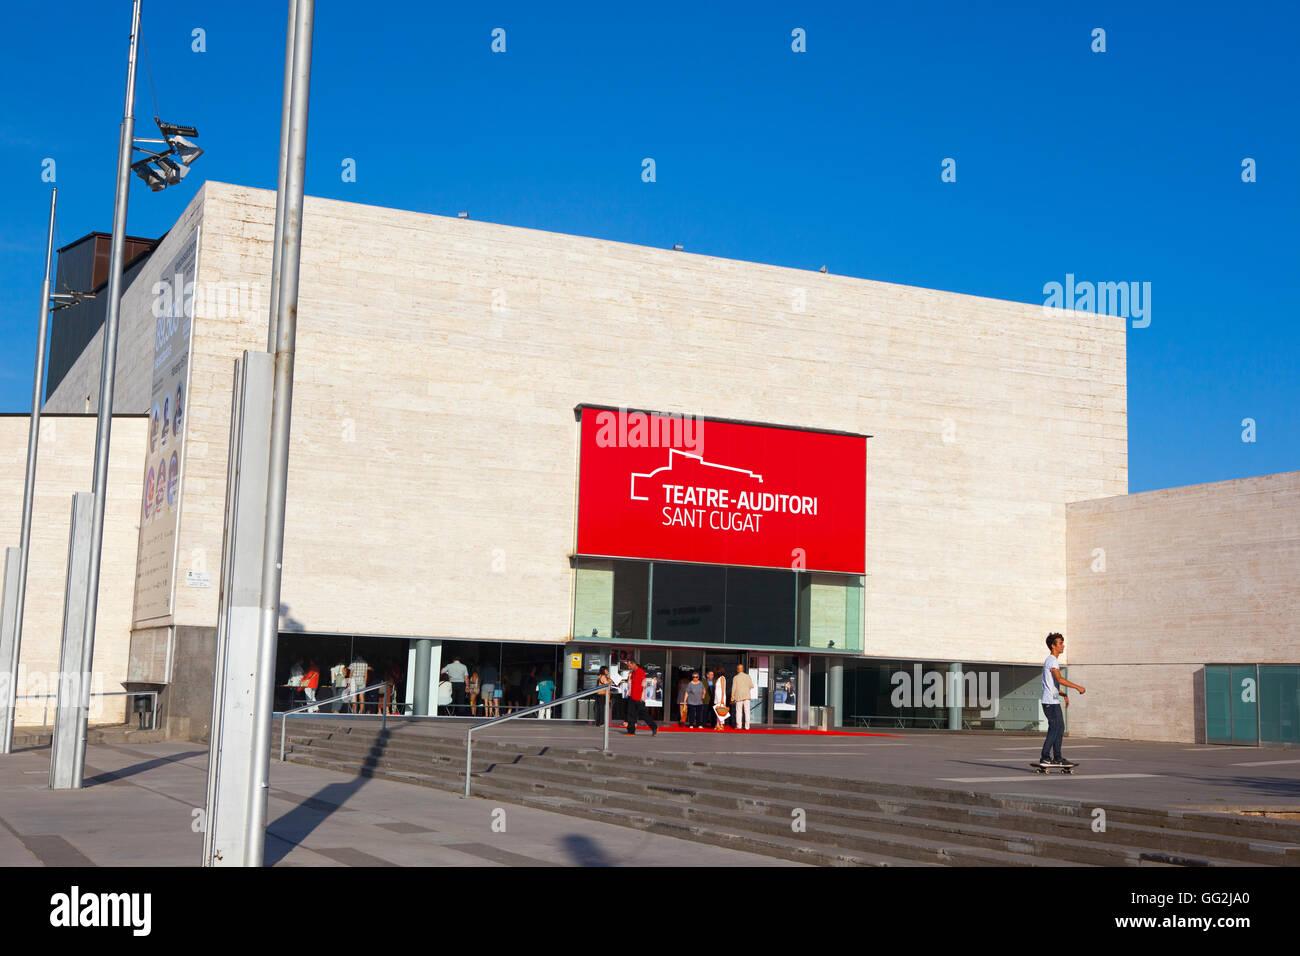 Teatre Auditori, Sant Cugat del Valles, Barcelona, Catalonia, Spain - Stock Image